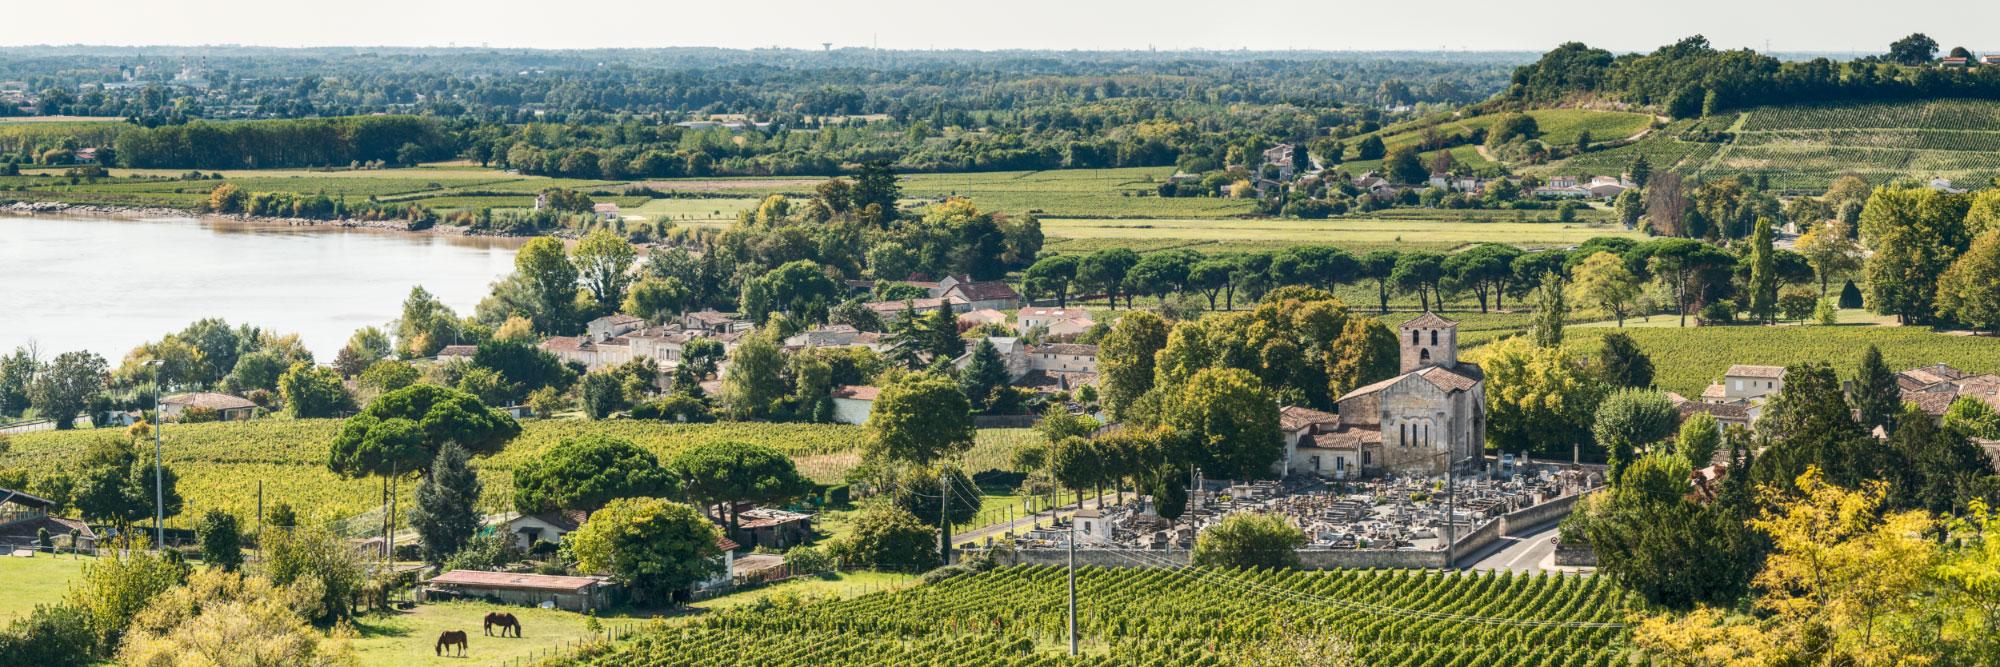 15-15152-france-gironde-la-dordogne-vue-du-tertre-de-fronsac-panorama-sentucq-h